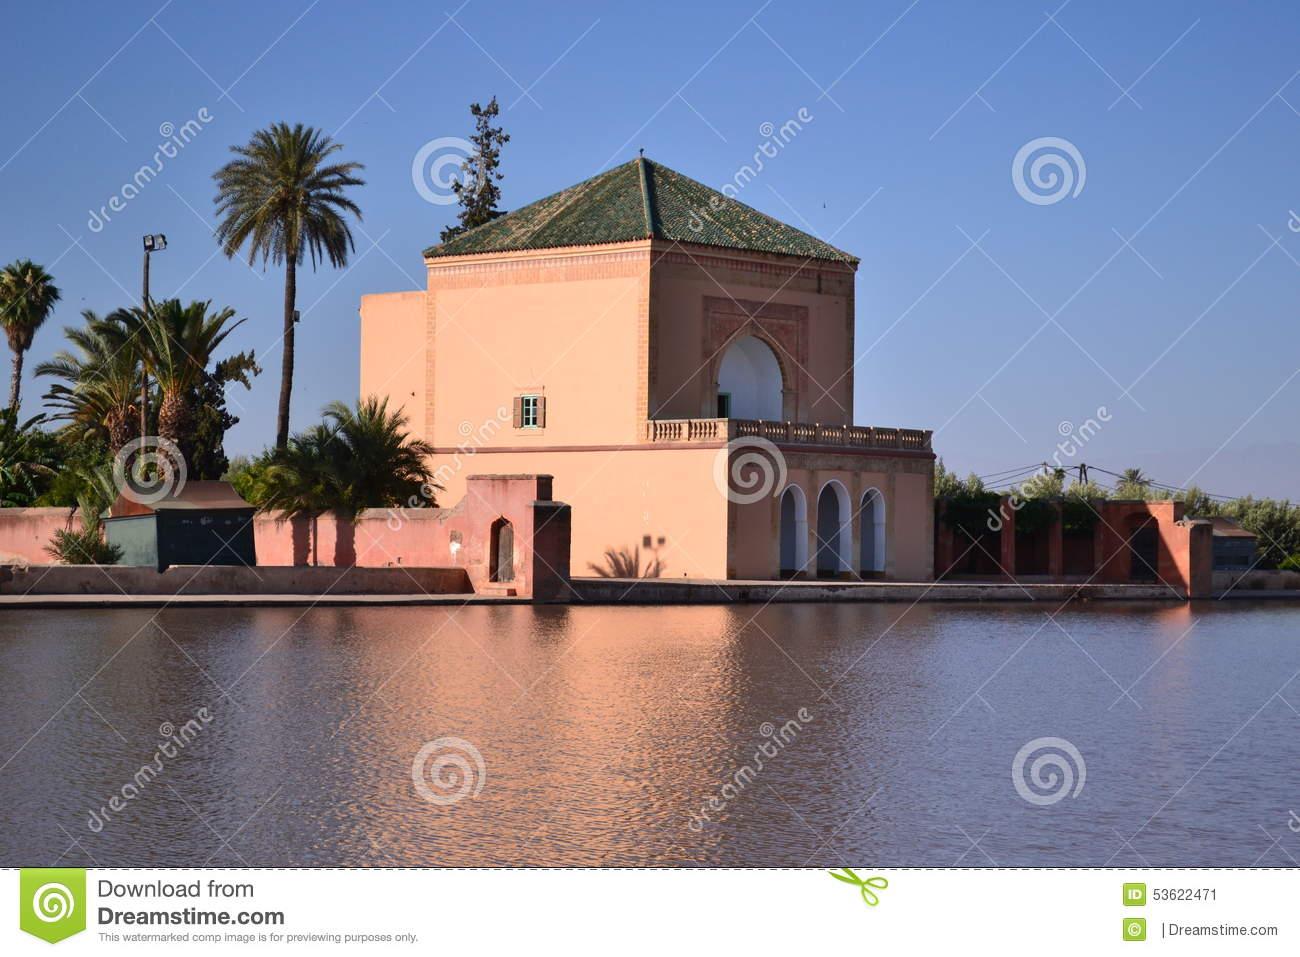 pavillion menara garden basin marrakech morocco found where have green pyramid roof menzeh